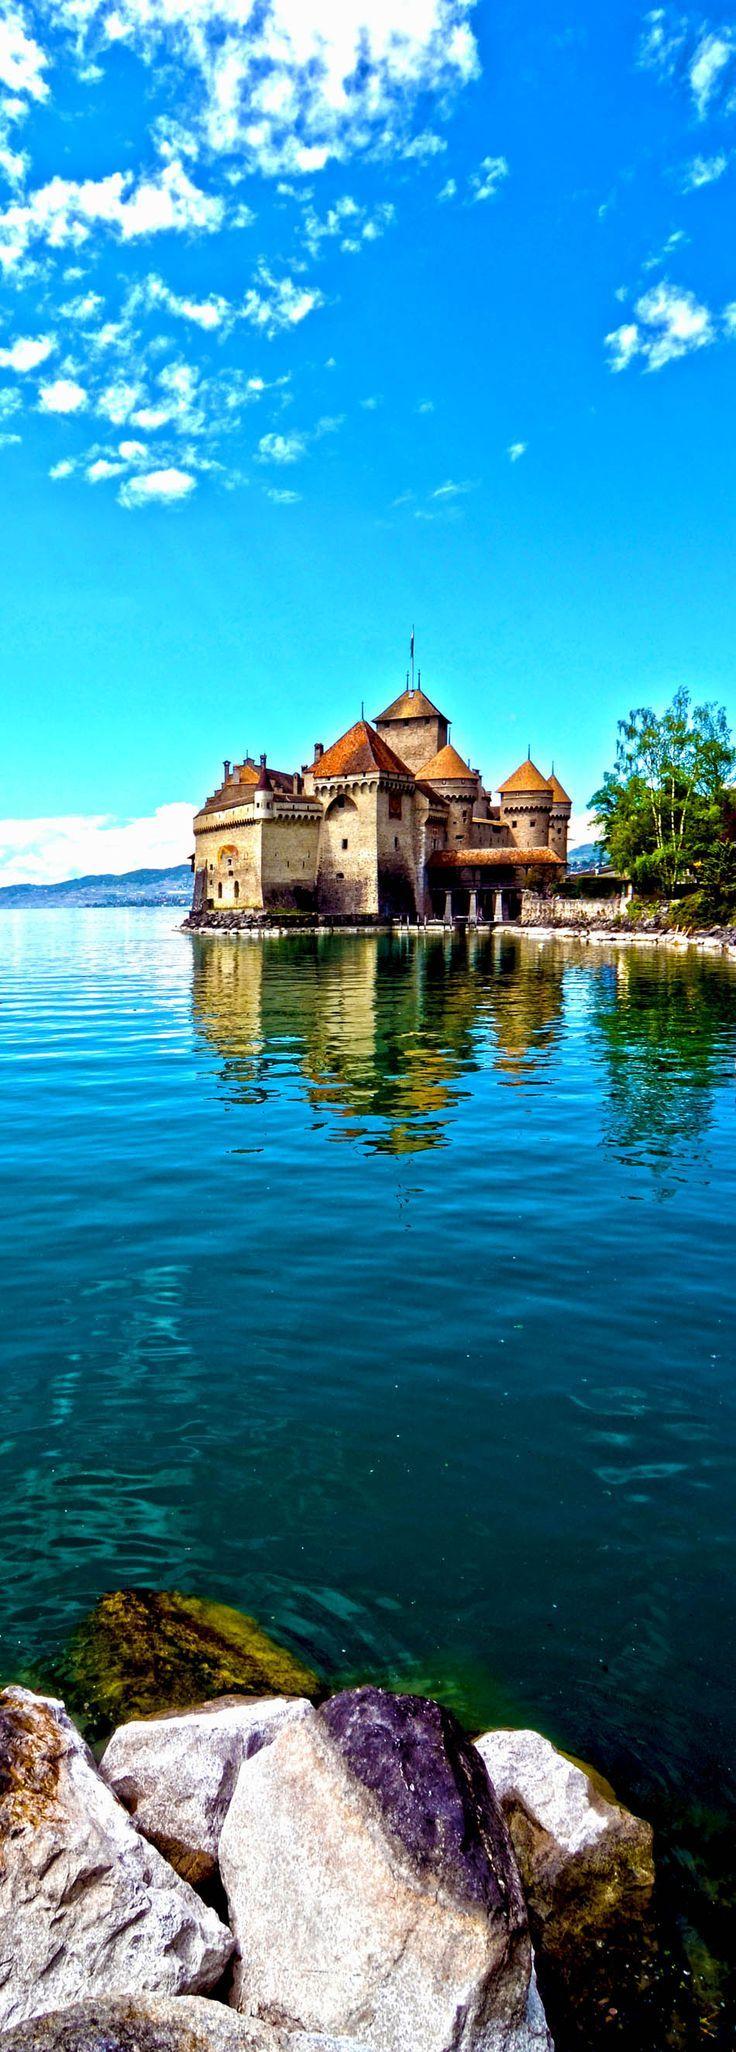 Chillon Castle at Geneva lake in Switzerland